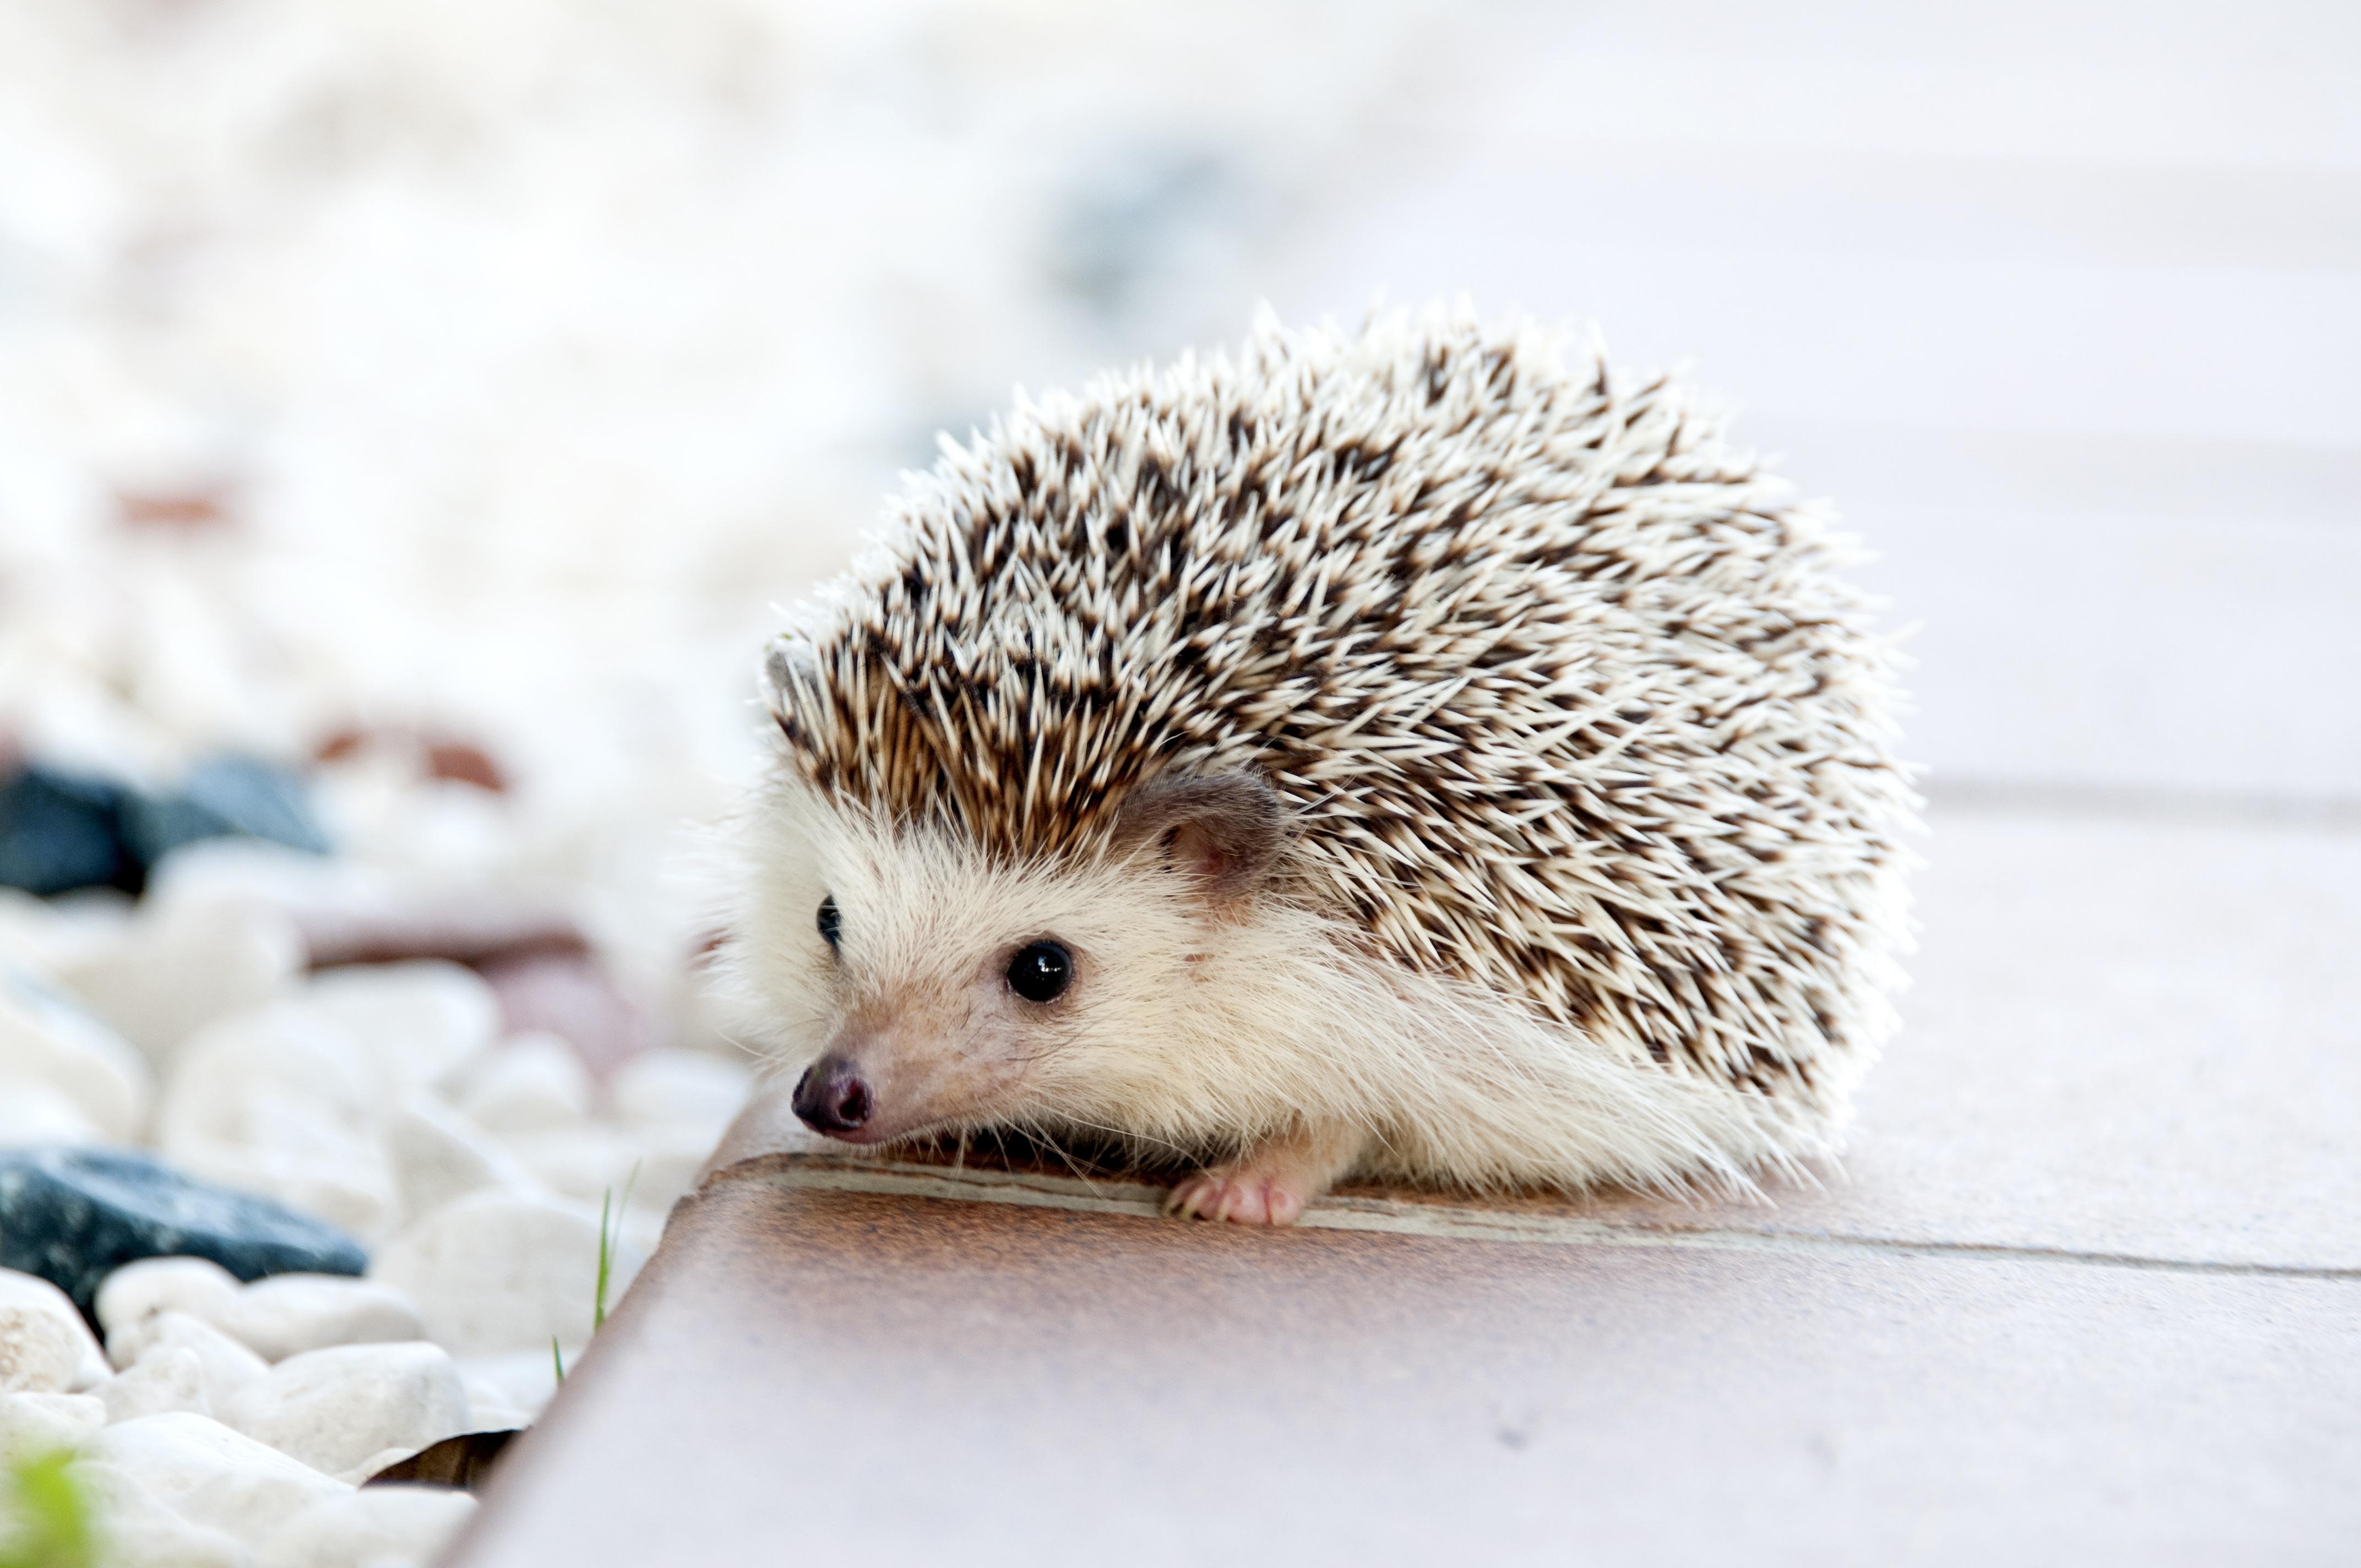 animal cute pet small mammal baby fauna whiskers hedgehog vertebrate erinaceidae domesticated hedgehog